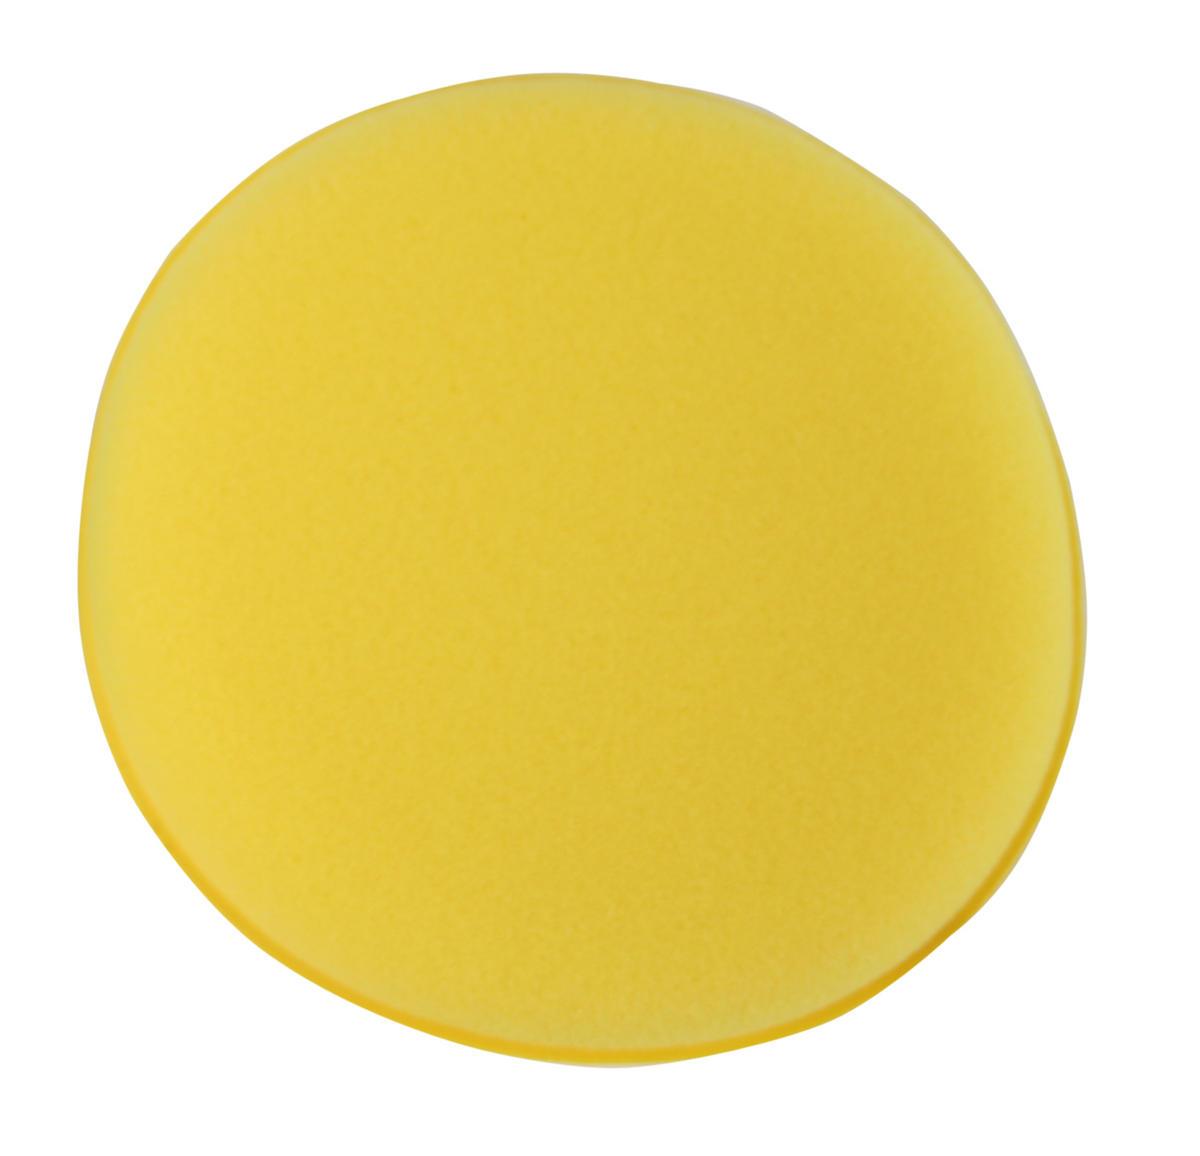 Kent Car Care Q9256 5'' Yellow Sponge Polish Applicator Pad